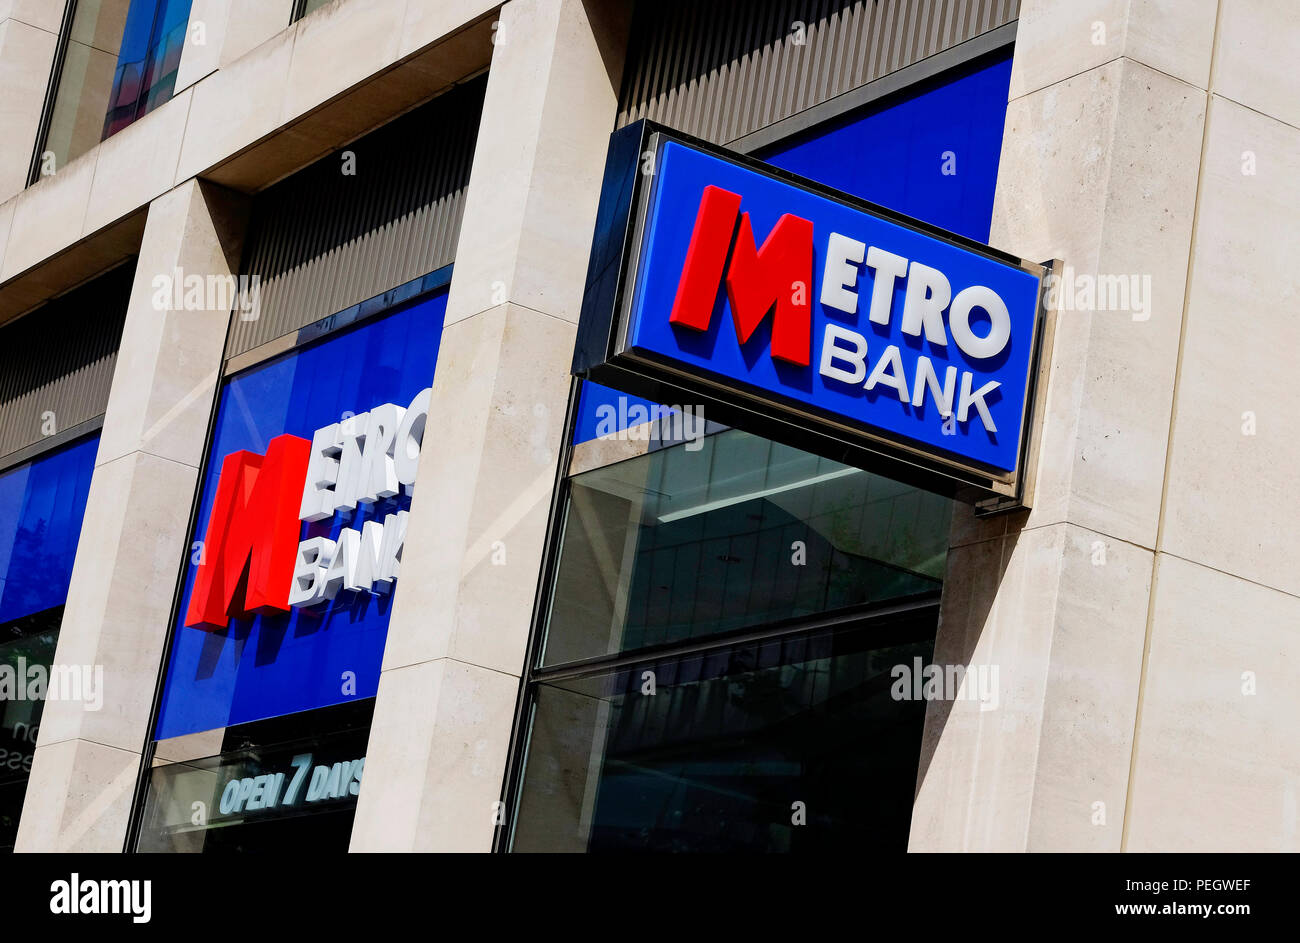 metro bank, london city centre, england - Stock Image